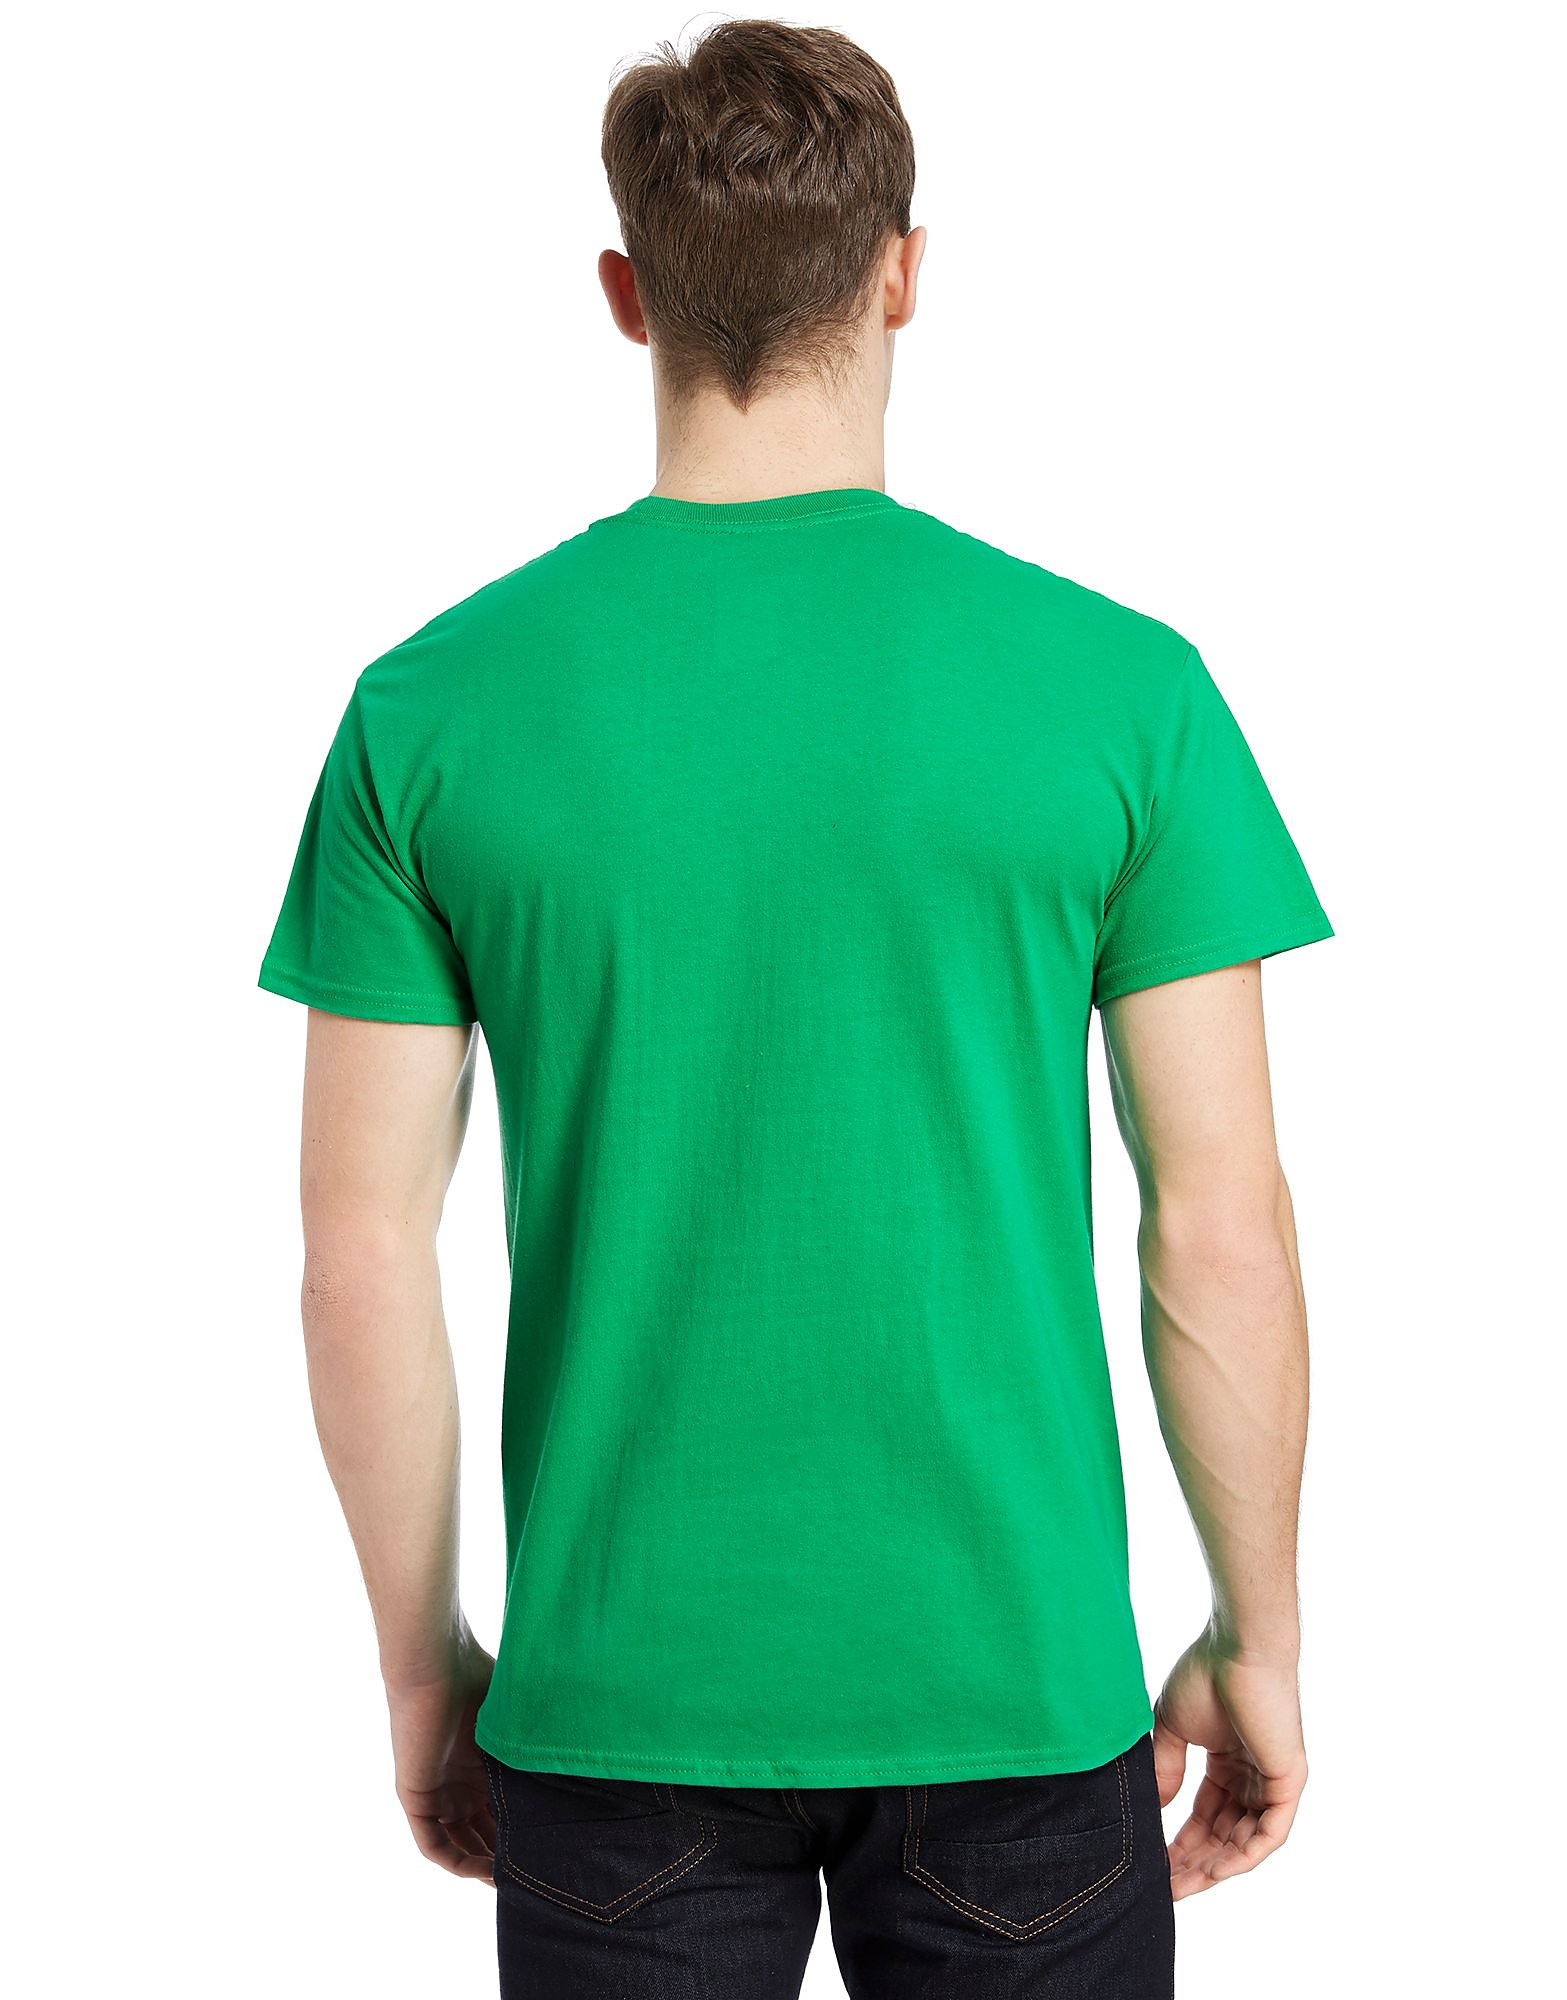 Official Team T-shirt Scroll FC Celtic